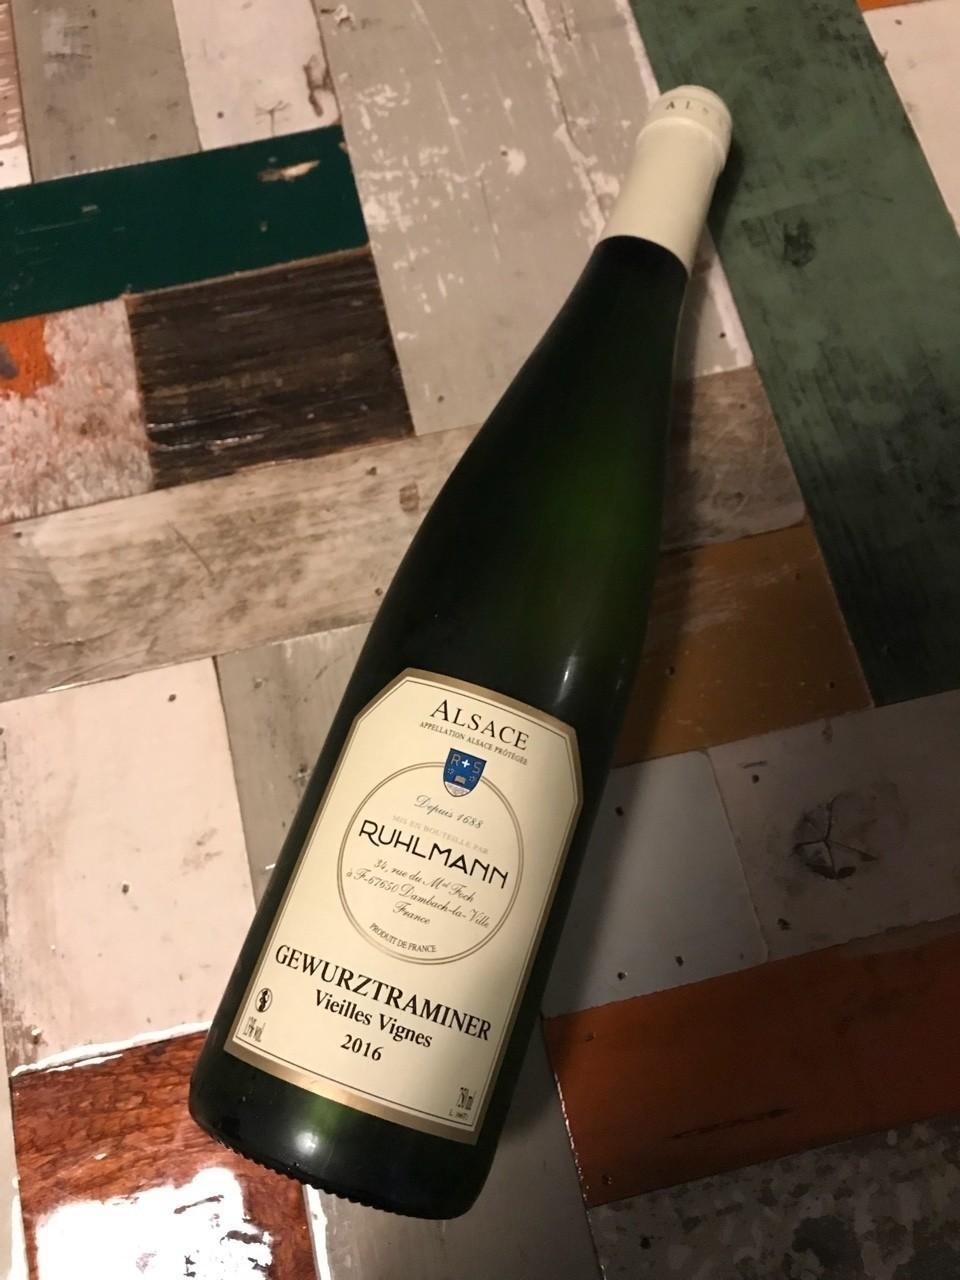 #wine #vino #ワイン #白ワイン #葡萄酒 #酒